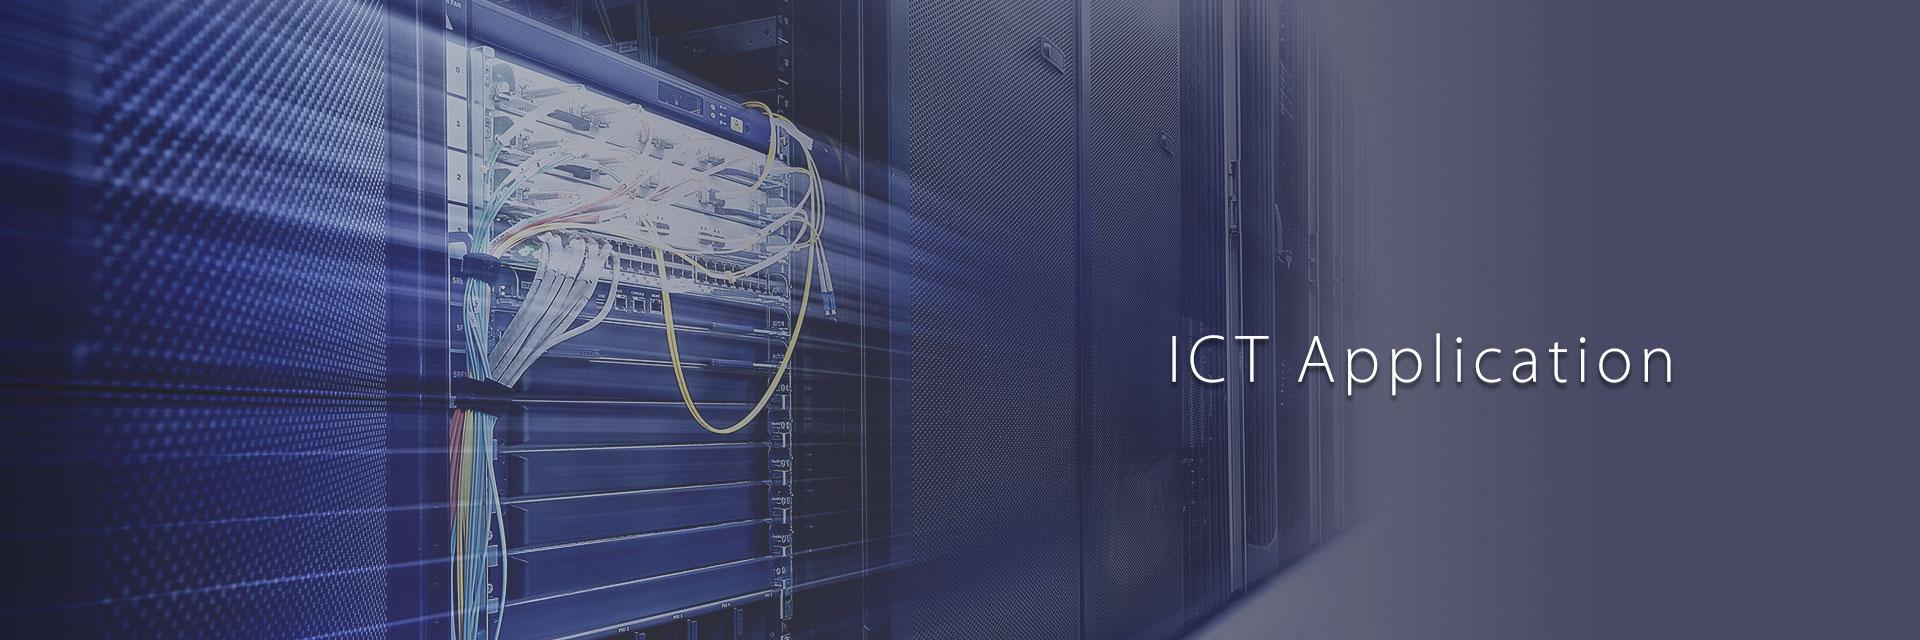 ITC Application